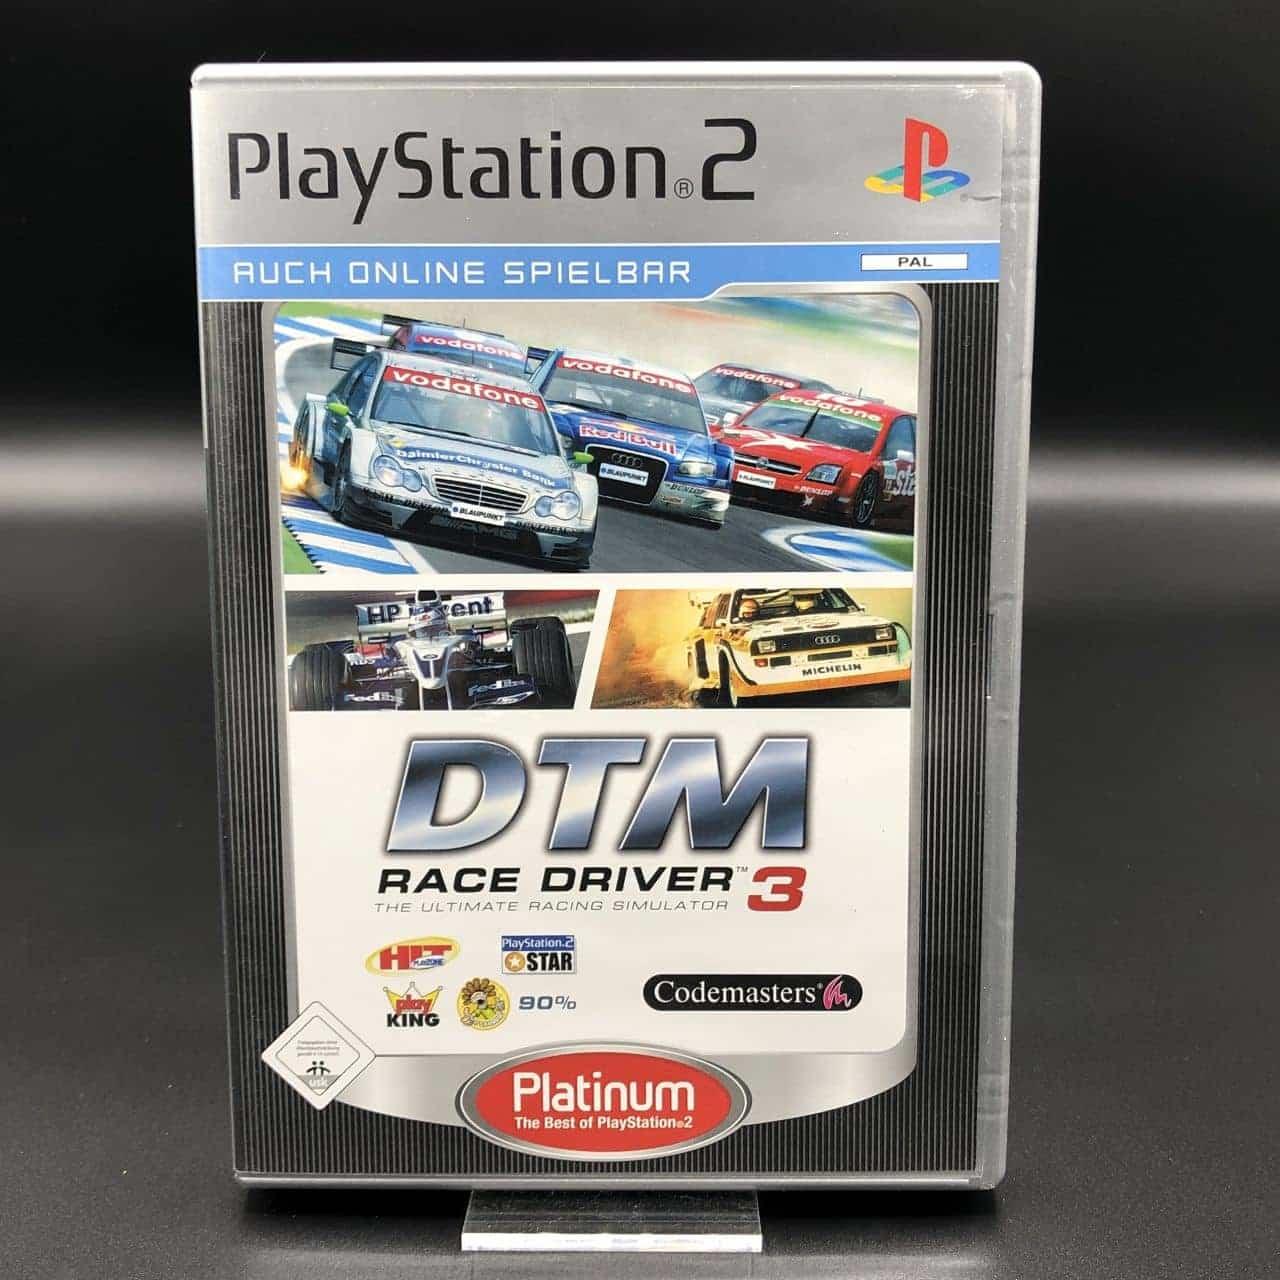 PS2 DTM Race Driver 3 (Platinum) (Komplett) (Sehr gut) Sony PlayStation 2